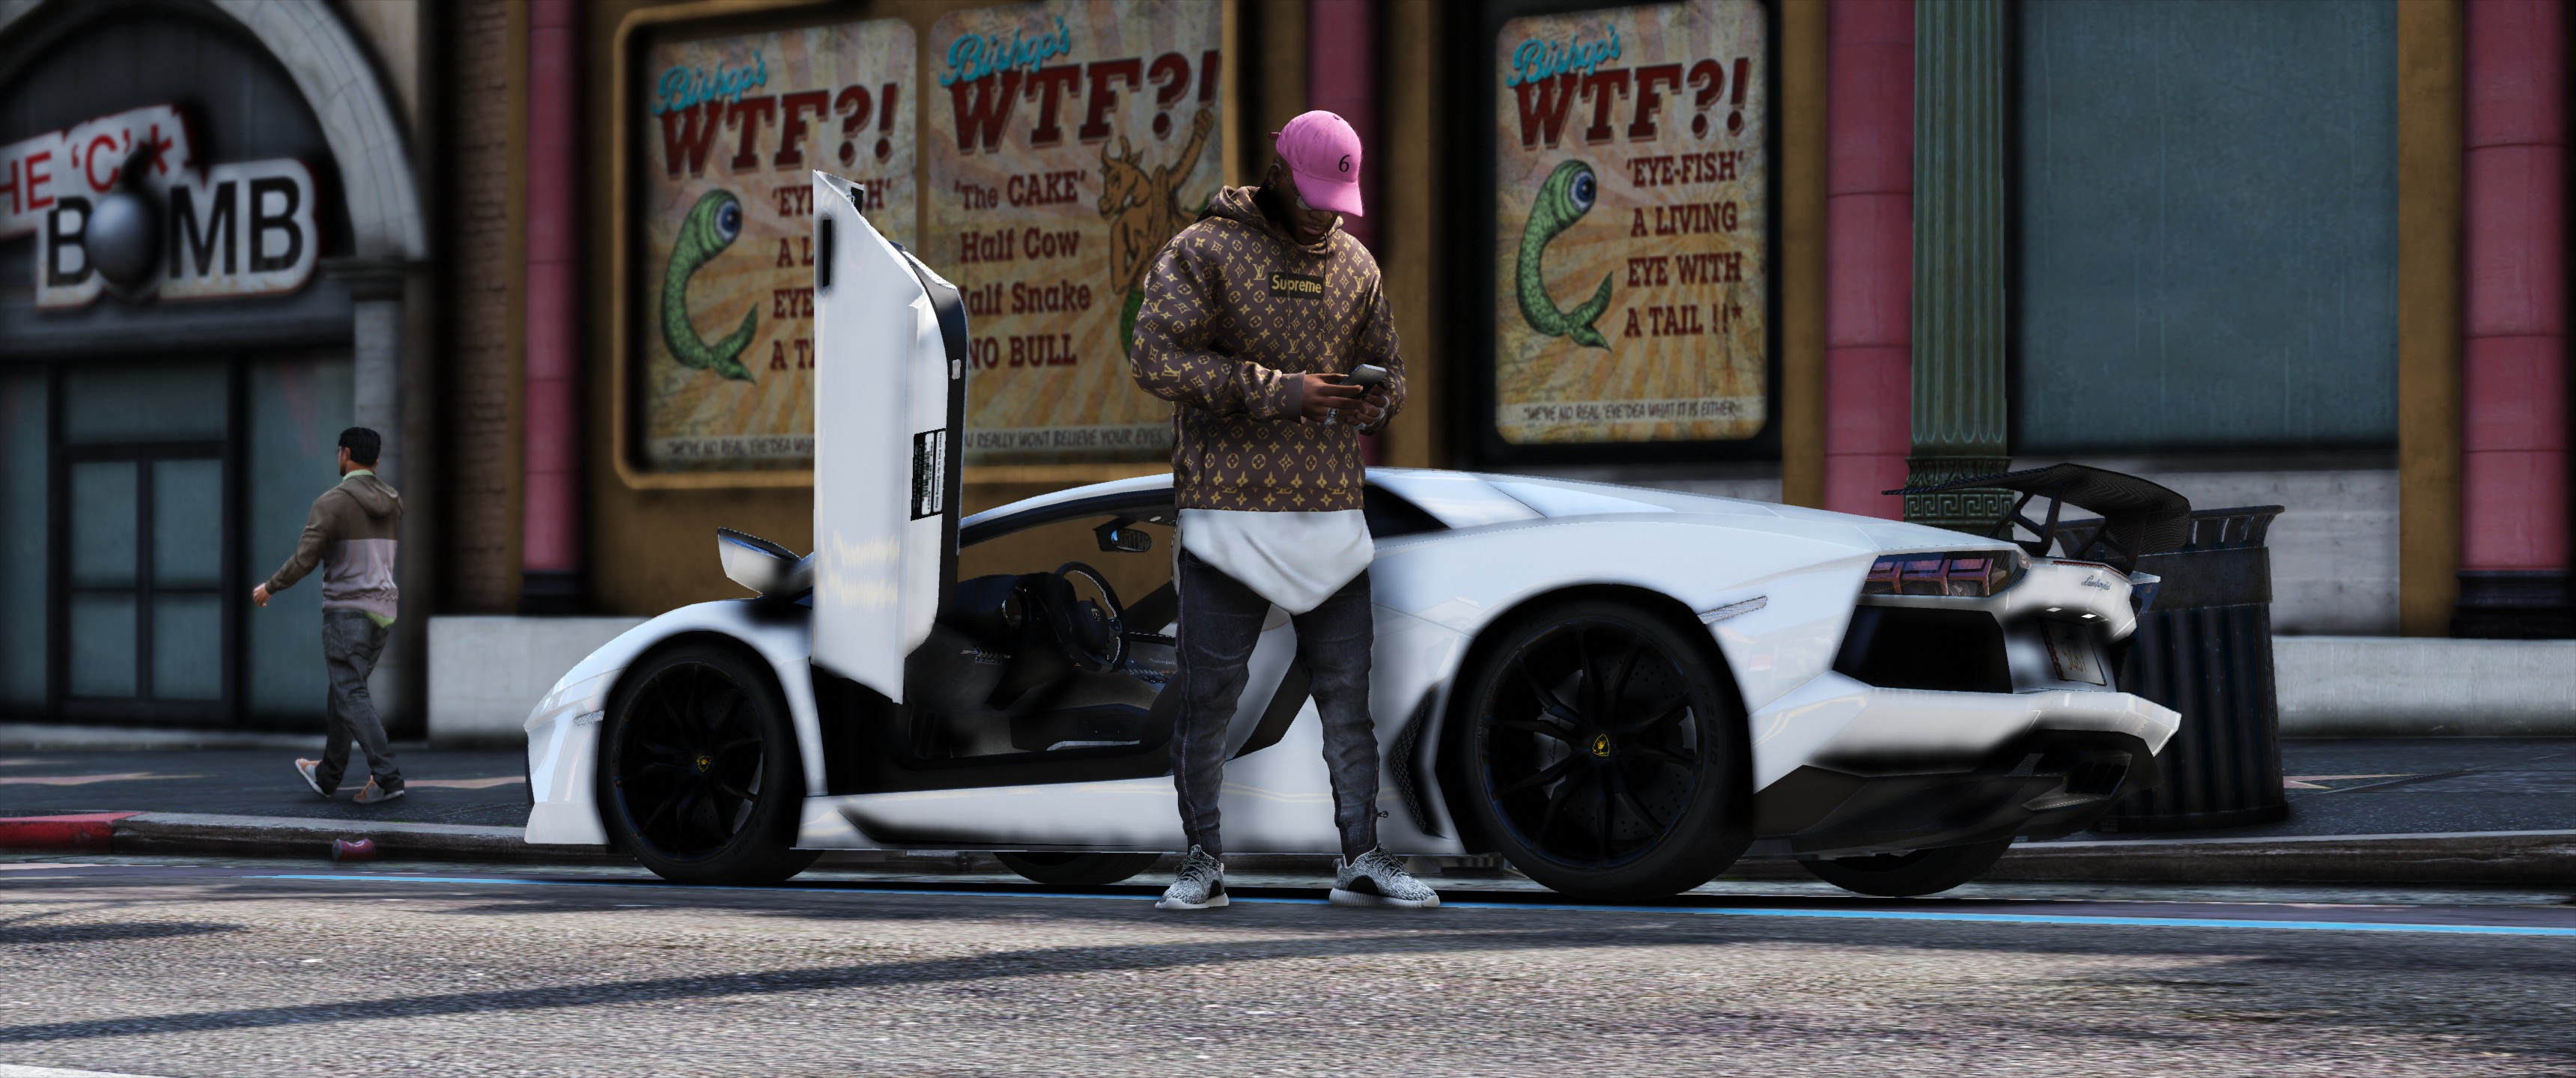 Supreme Louis vuitton hoodie Brown - GTA5-Mods com